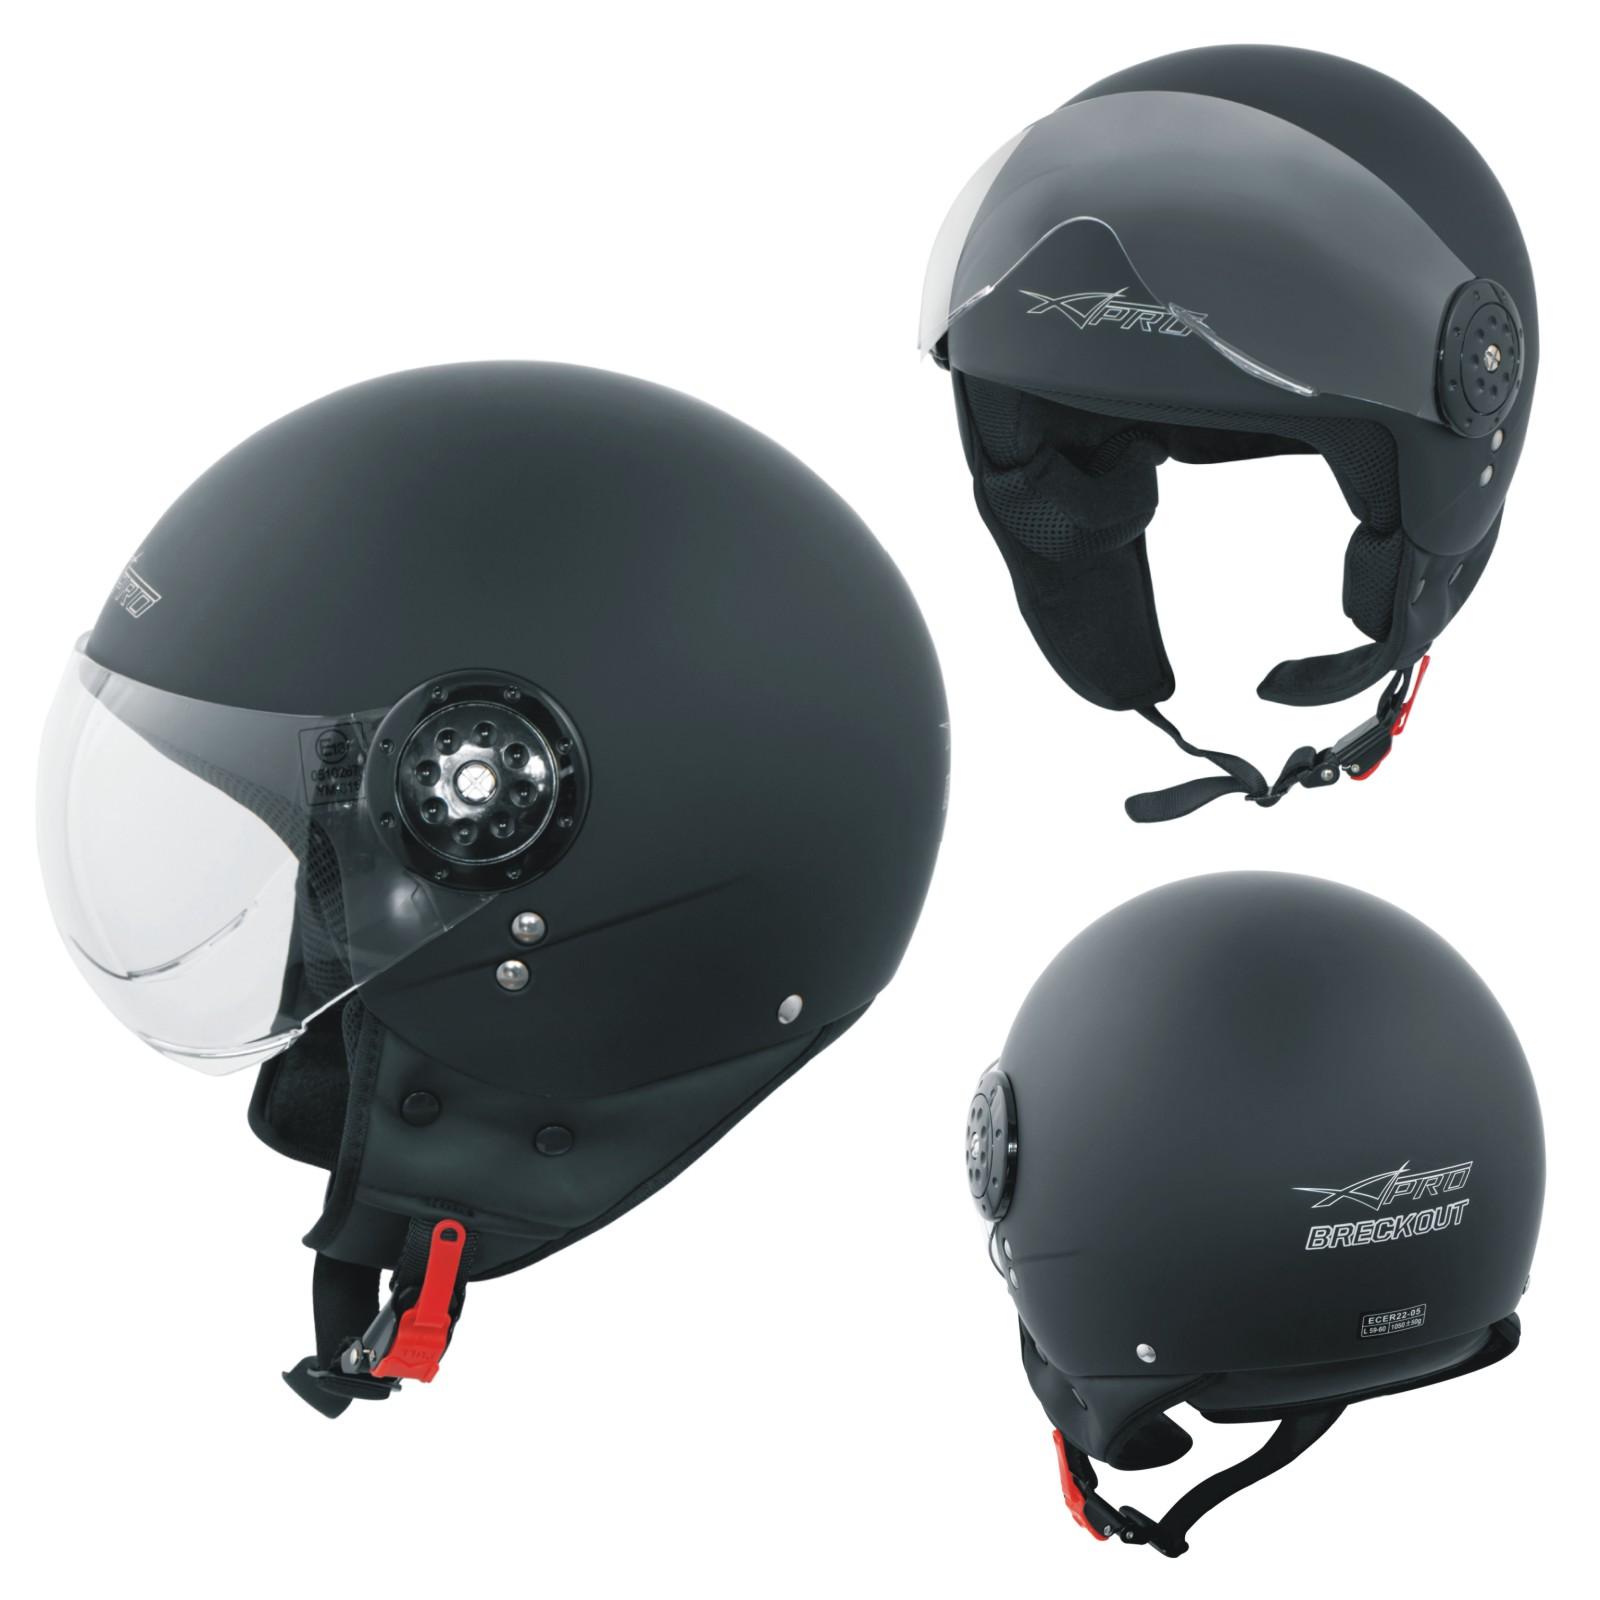 Scooter-Casque-Moto-Ville-Jet-Demi-Anti-Scratch-Avio-Visiere-noir-mat